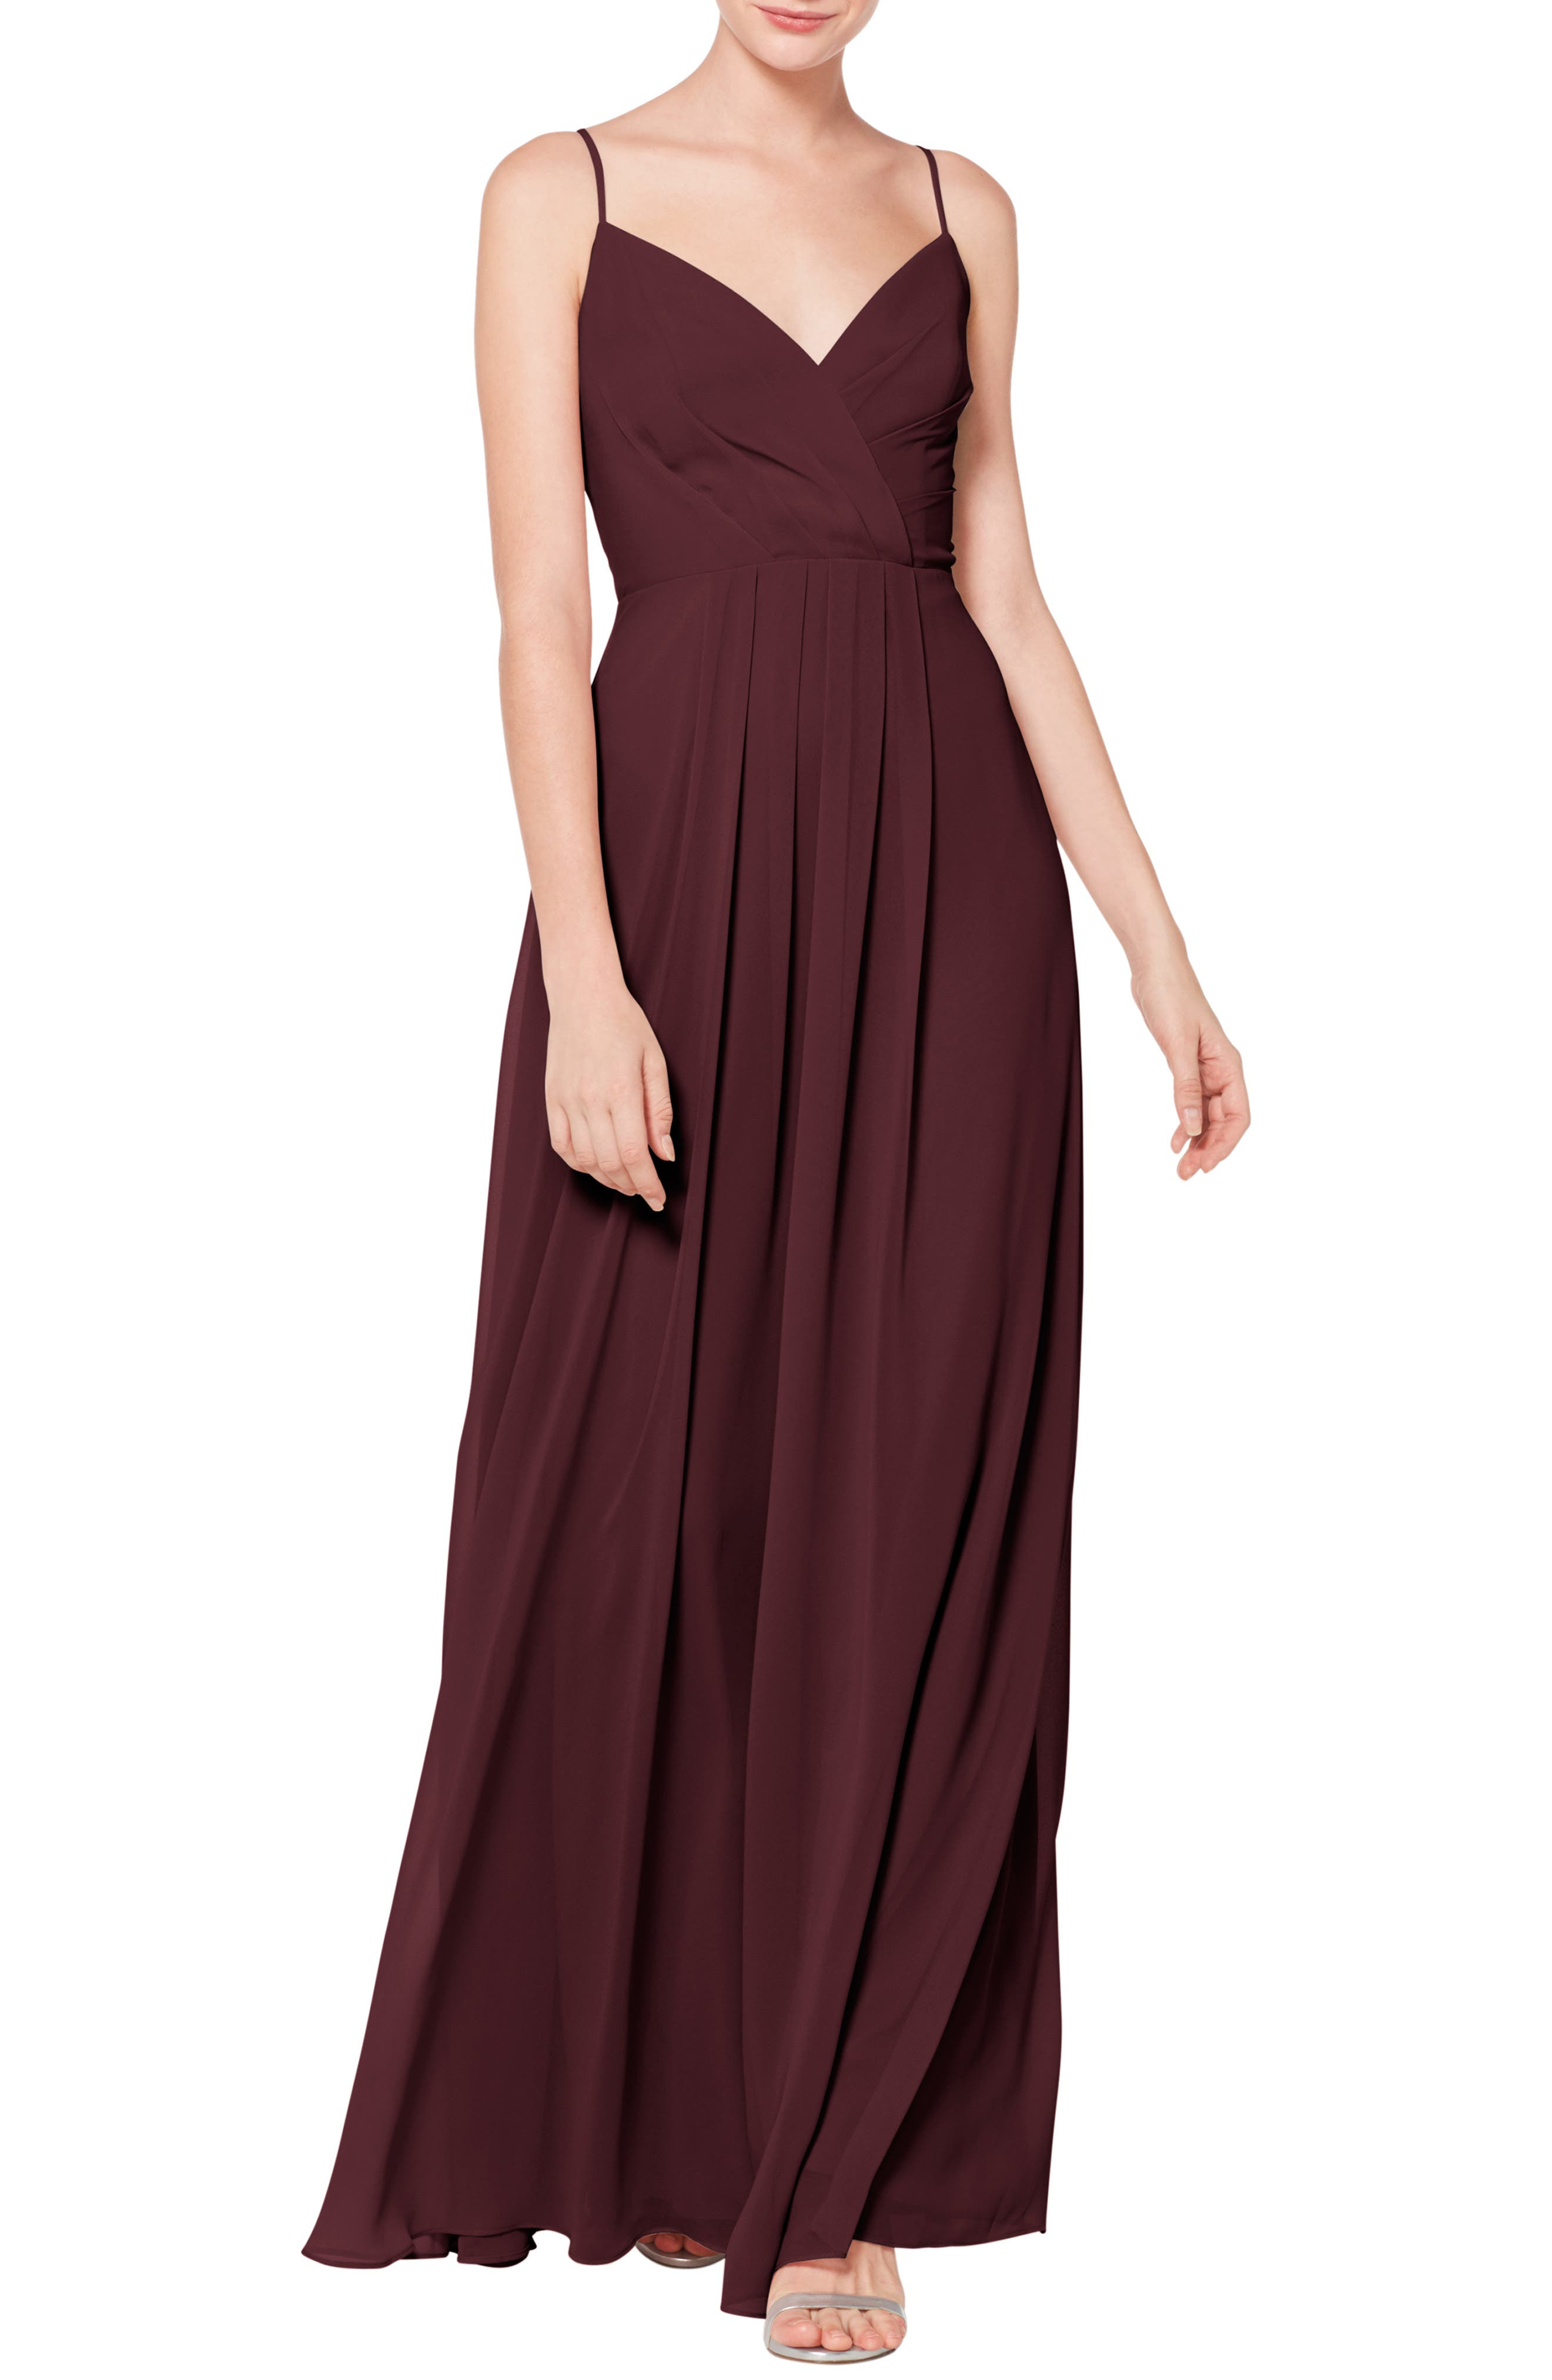 #levkoff Surplice Neck Chiffon Evening Dress, Burgundy